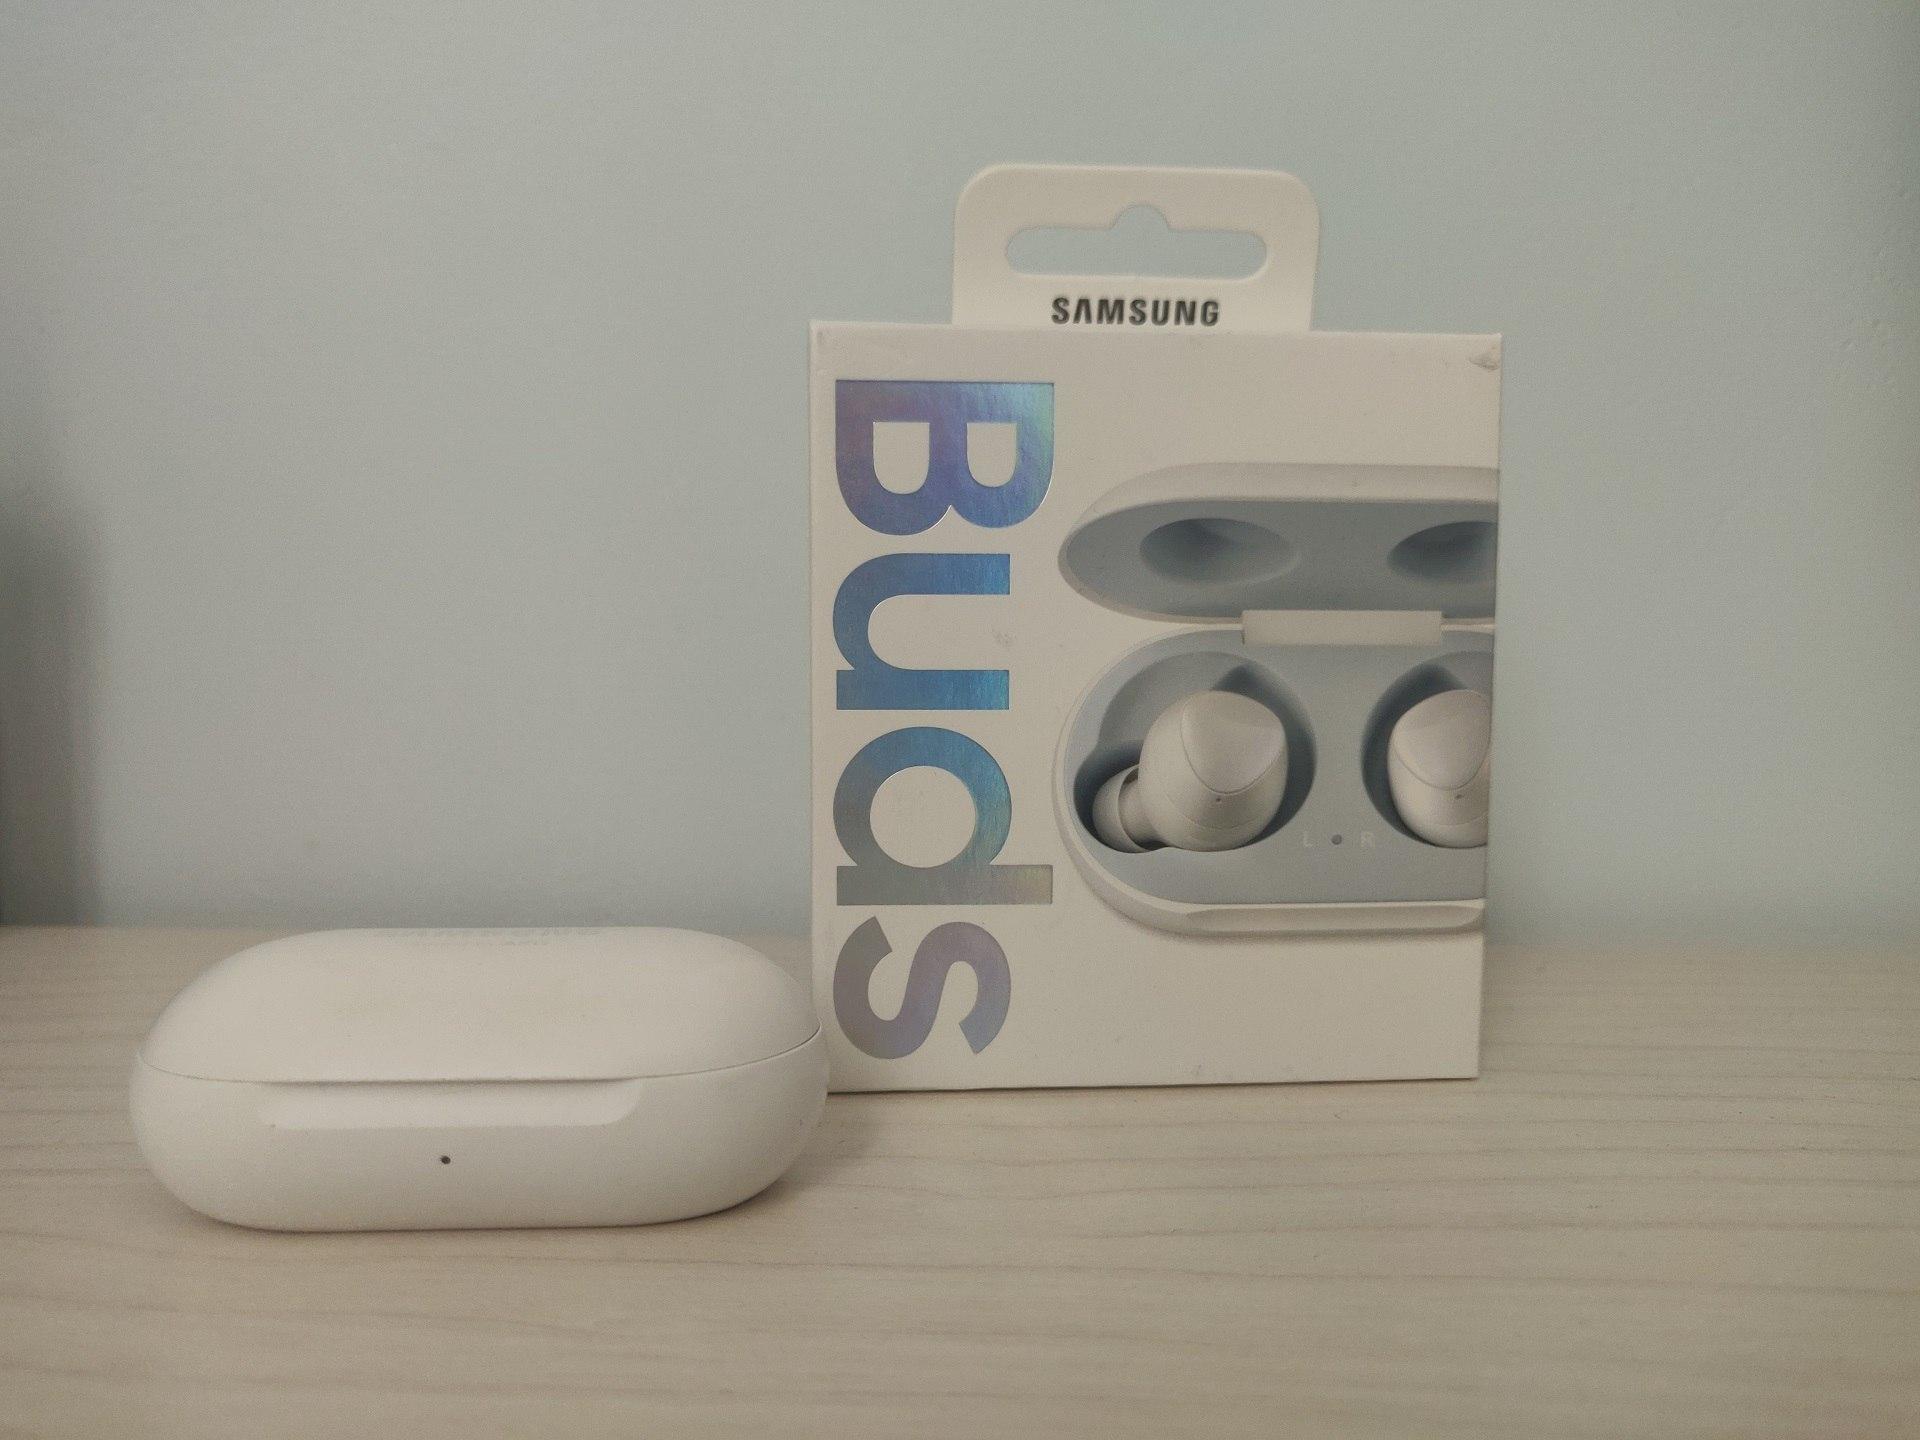 Samsung galaxy buds box